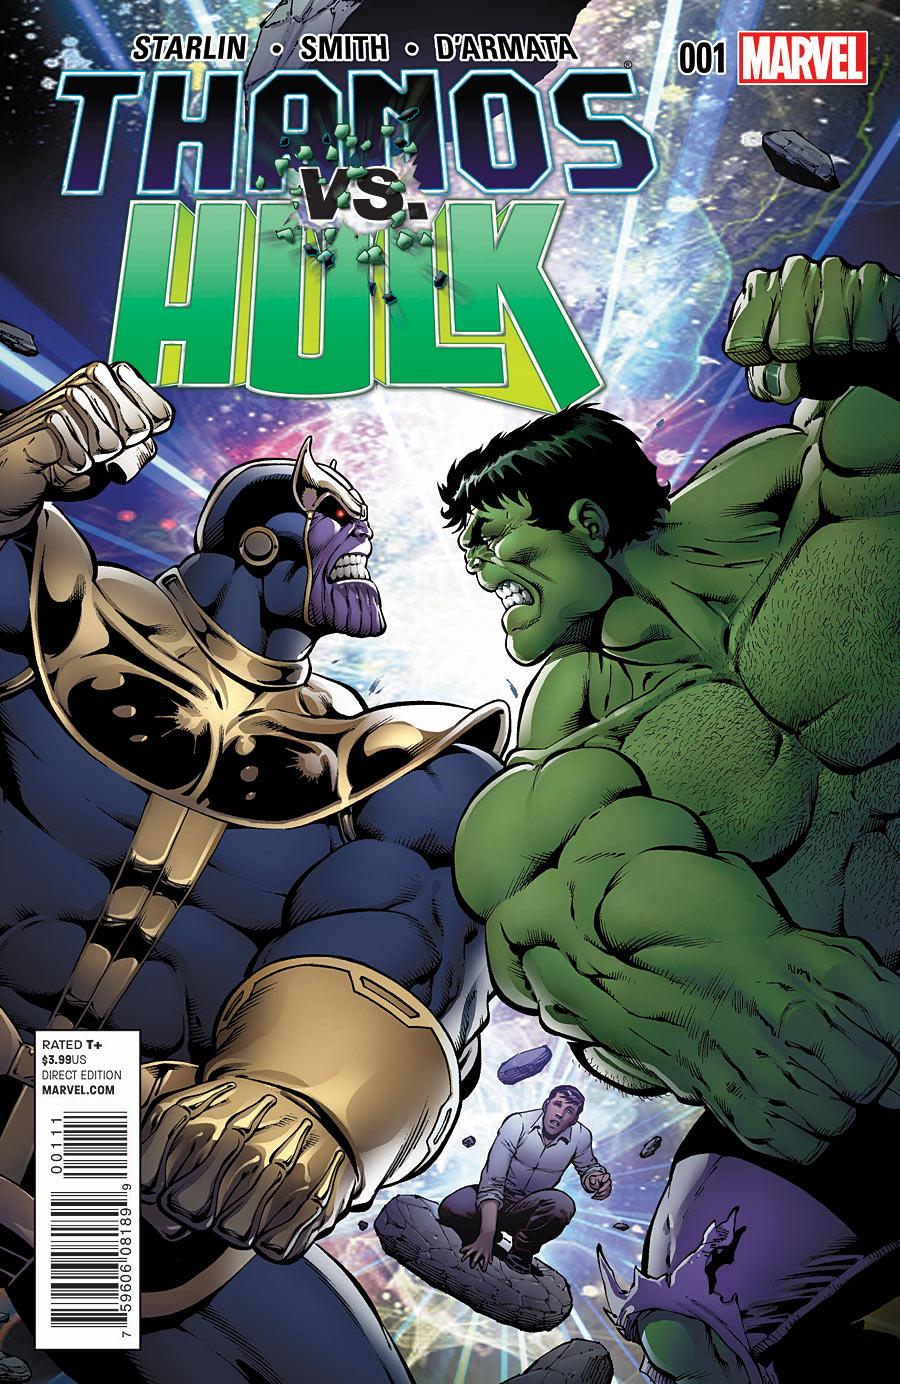 Infinity War Fotos >> Thanos vs. Hulk Vol 1 1 | Marvel Database | FANDOM powered by Wikia